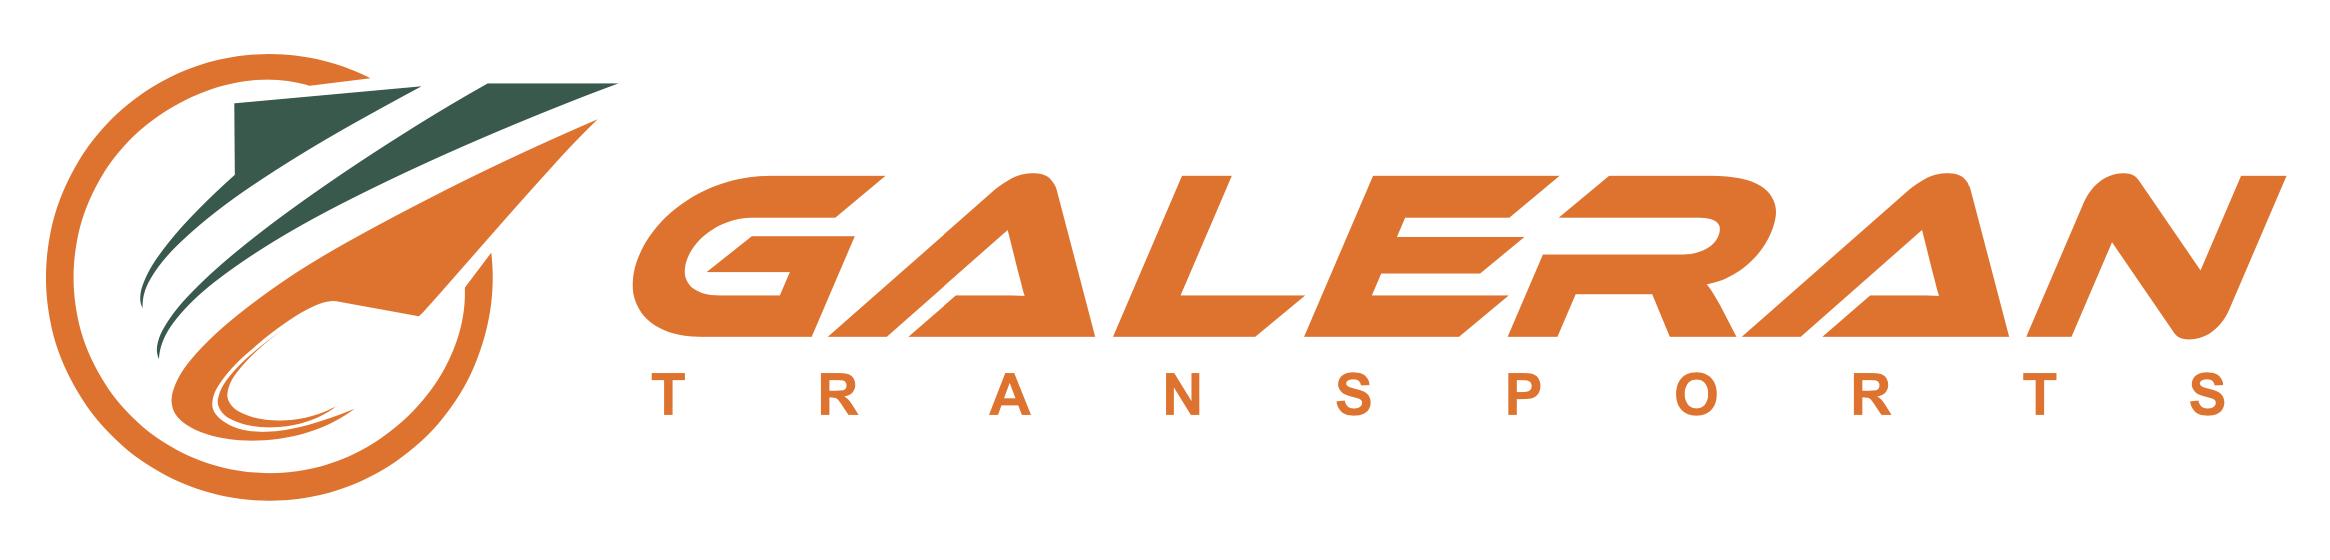 Transports Galeran